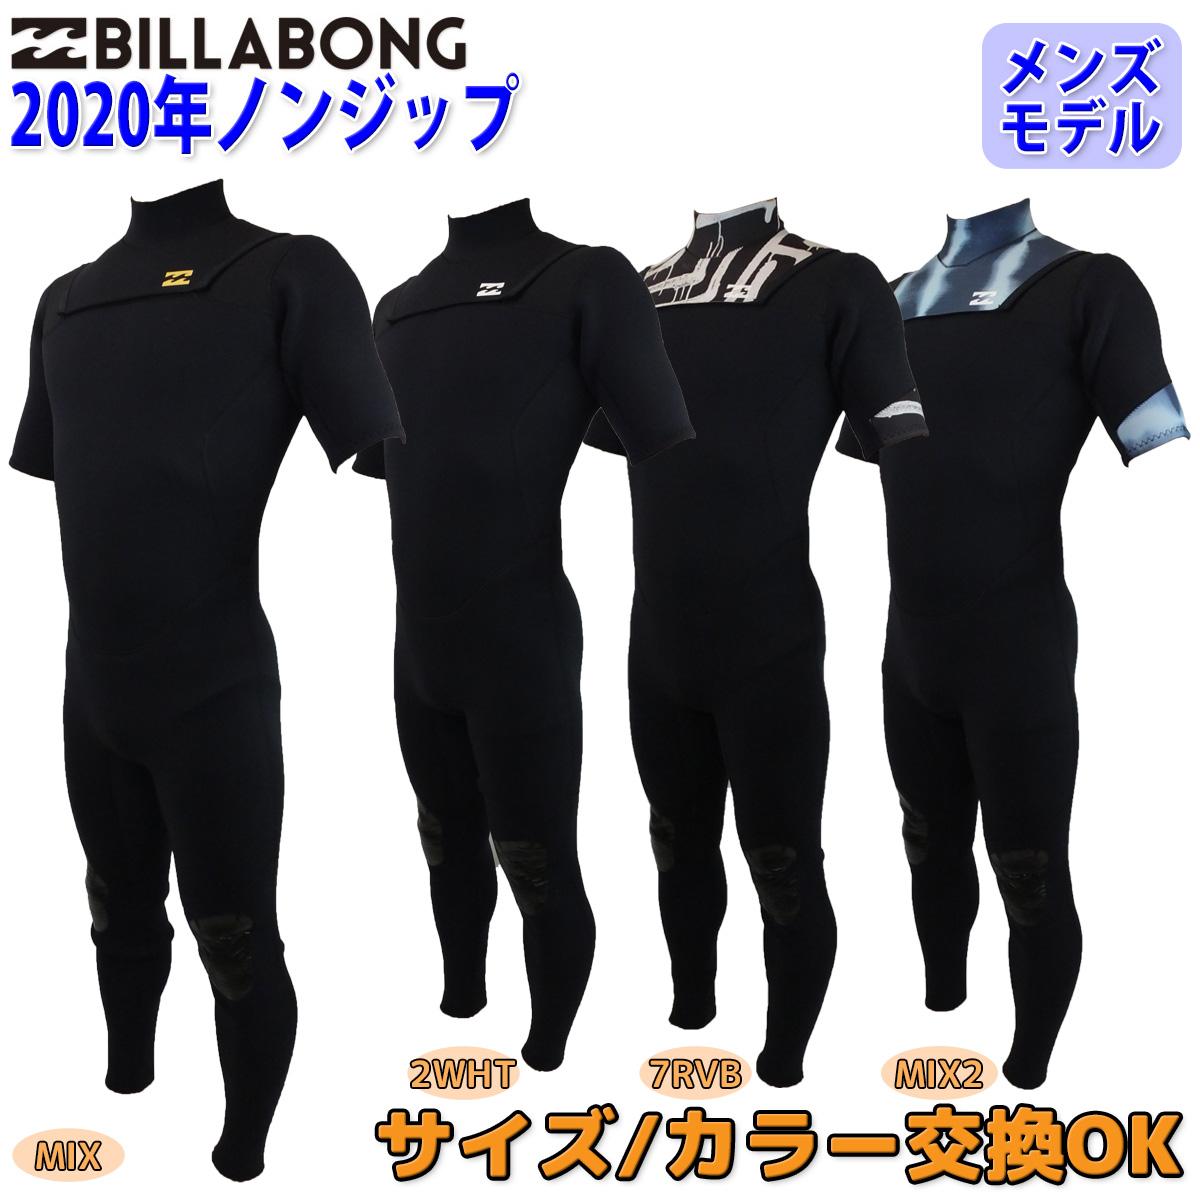 20 BILLABONG ビラボン シーガル ウェットスーツ ウエットスーツ ノンジップ バリュー 3ミリ 春夏用 メンズモデル 2020年 頂+SUPER FLEX マテリアル仕様品番BA018-051 日本正規品